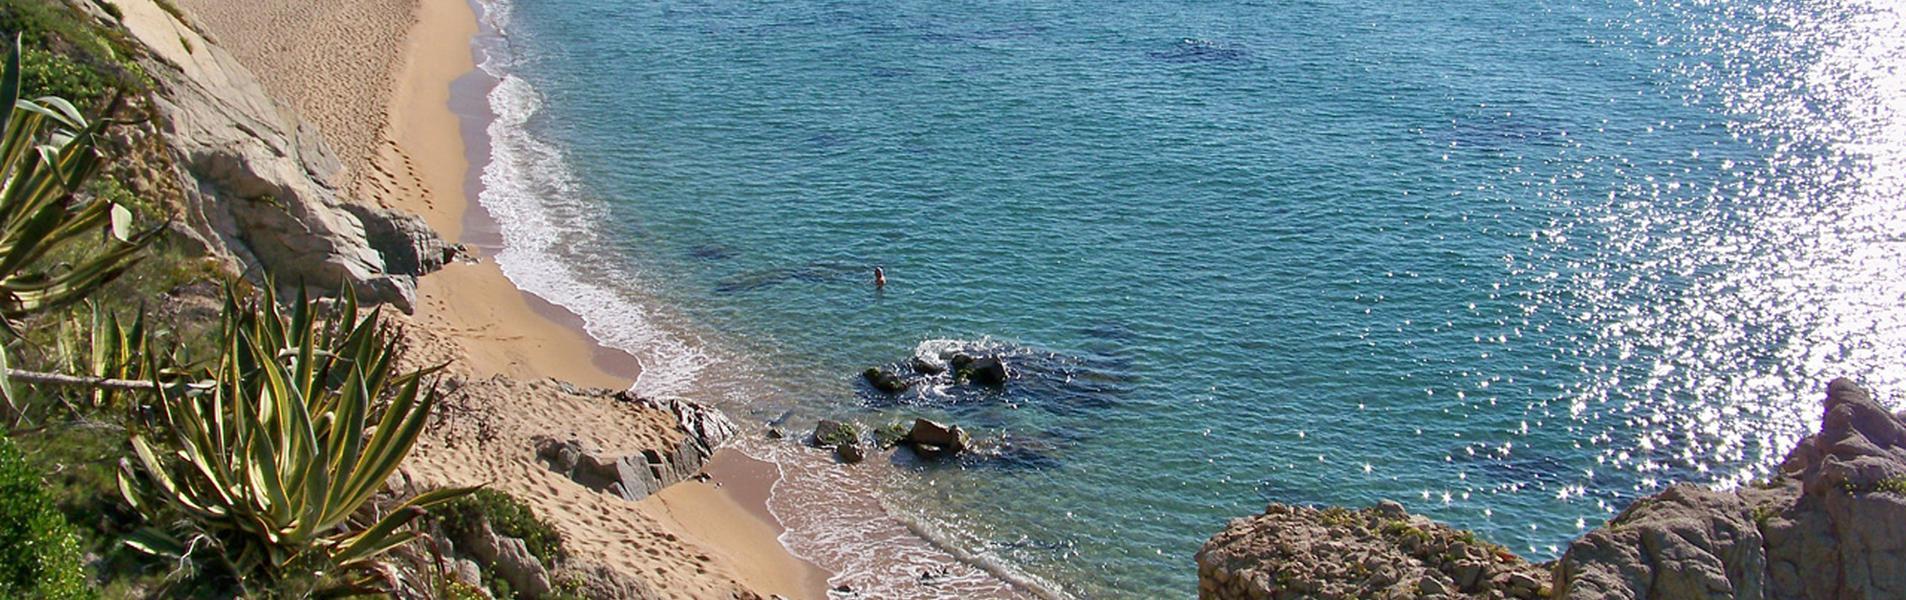 Arenys de Mar